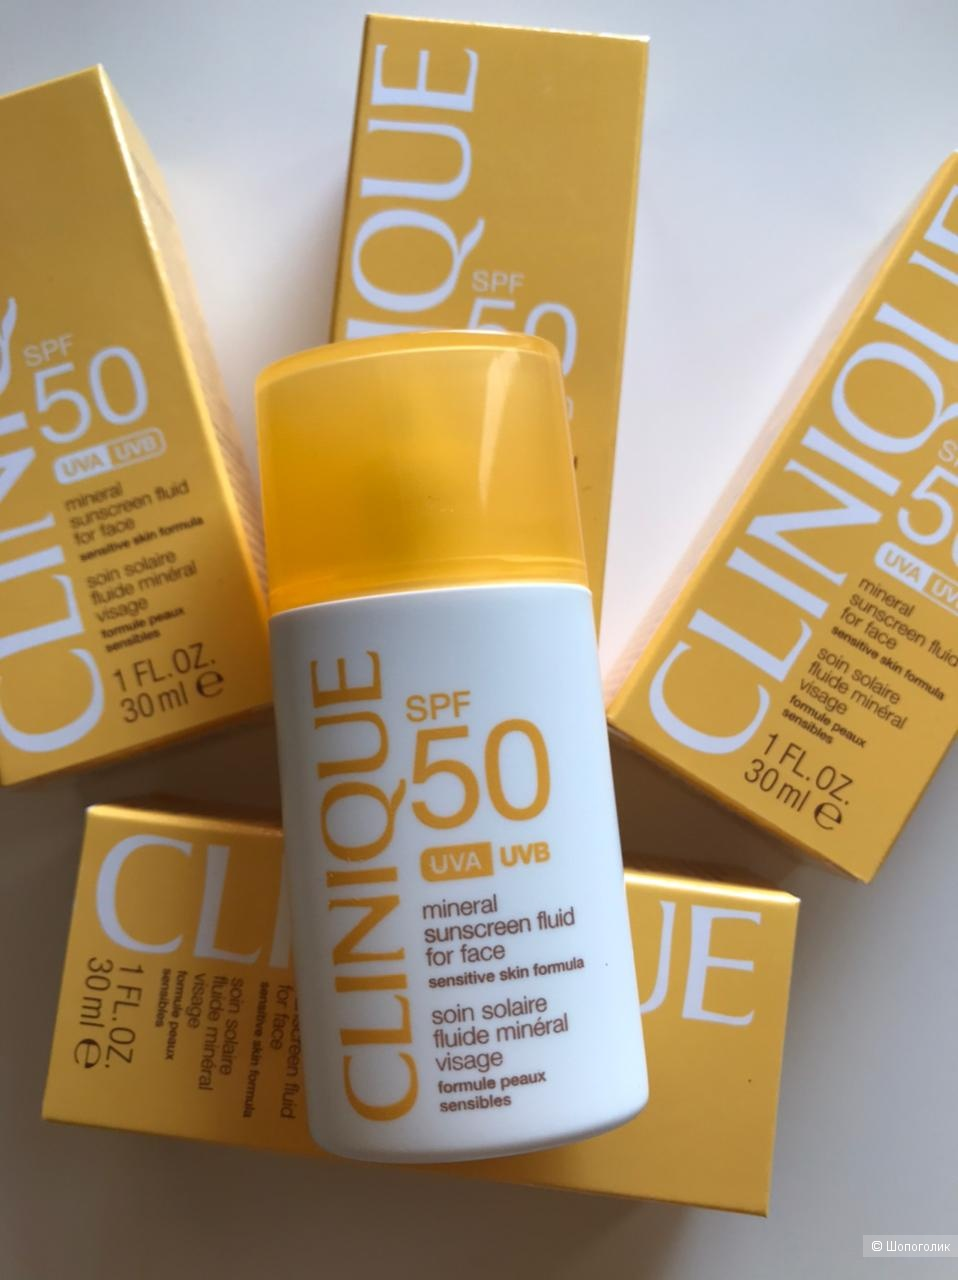 Солнцезащитный крем Clinique Mineral Sunscreen SPF 50